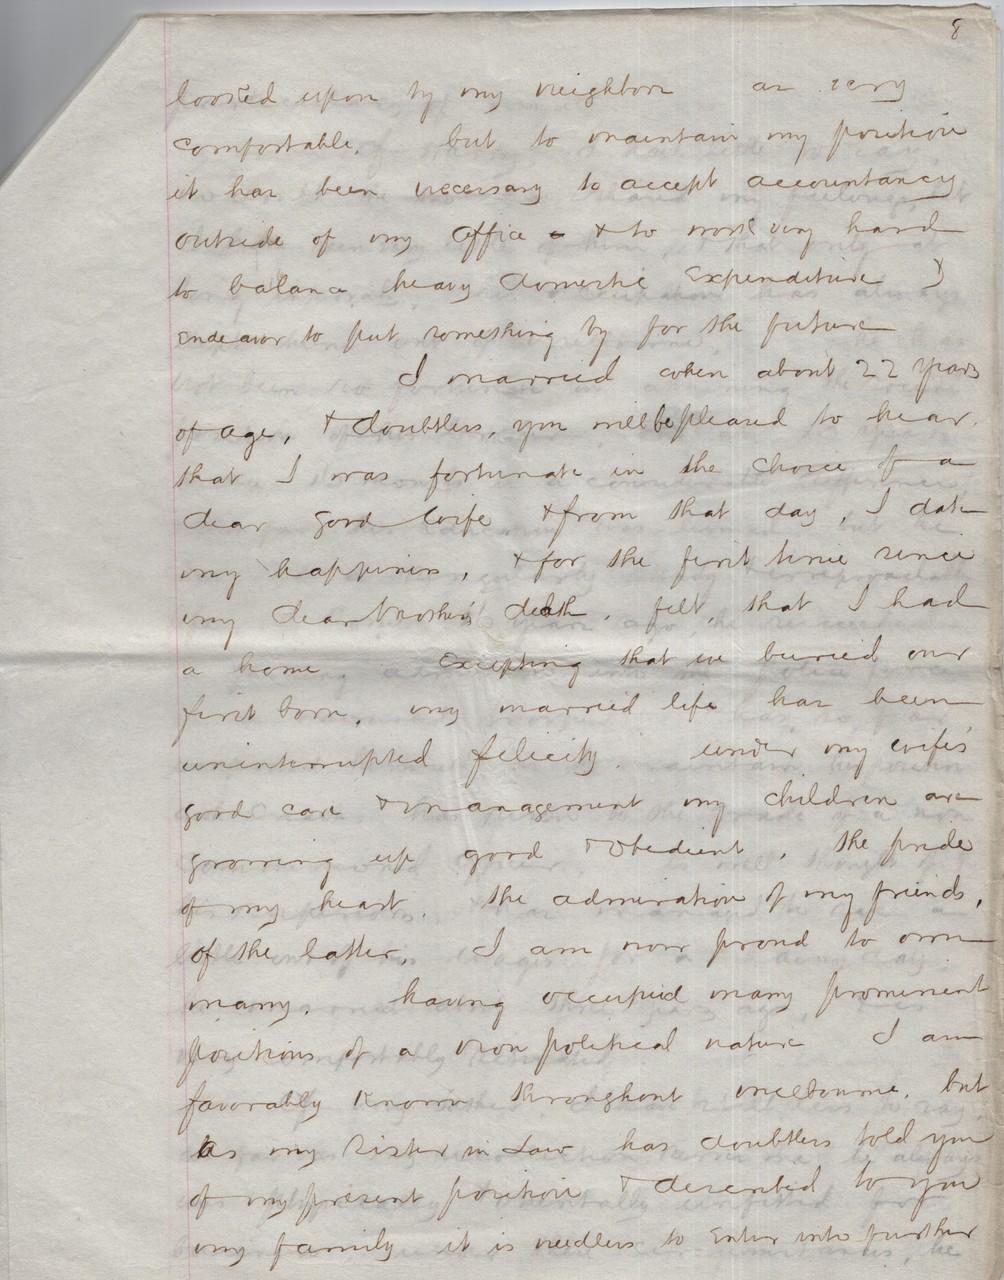 1879 WJR to MDL